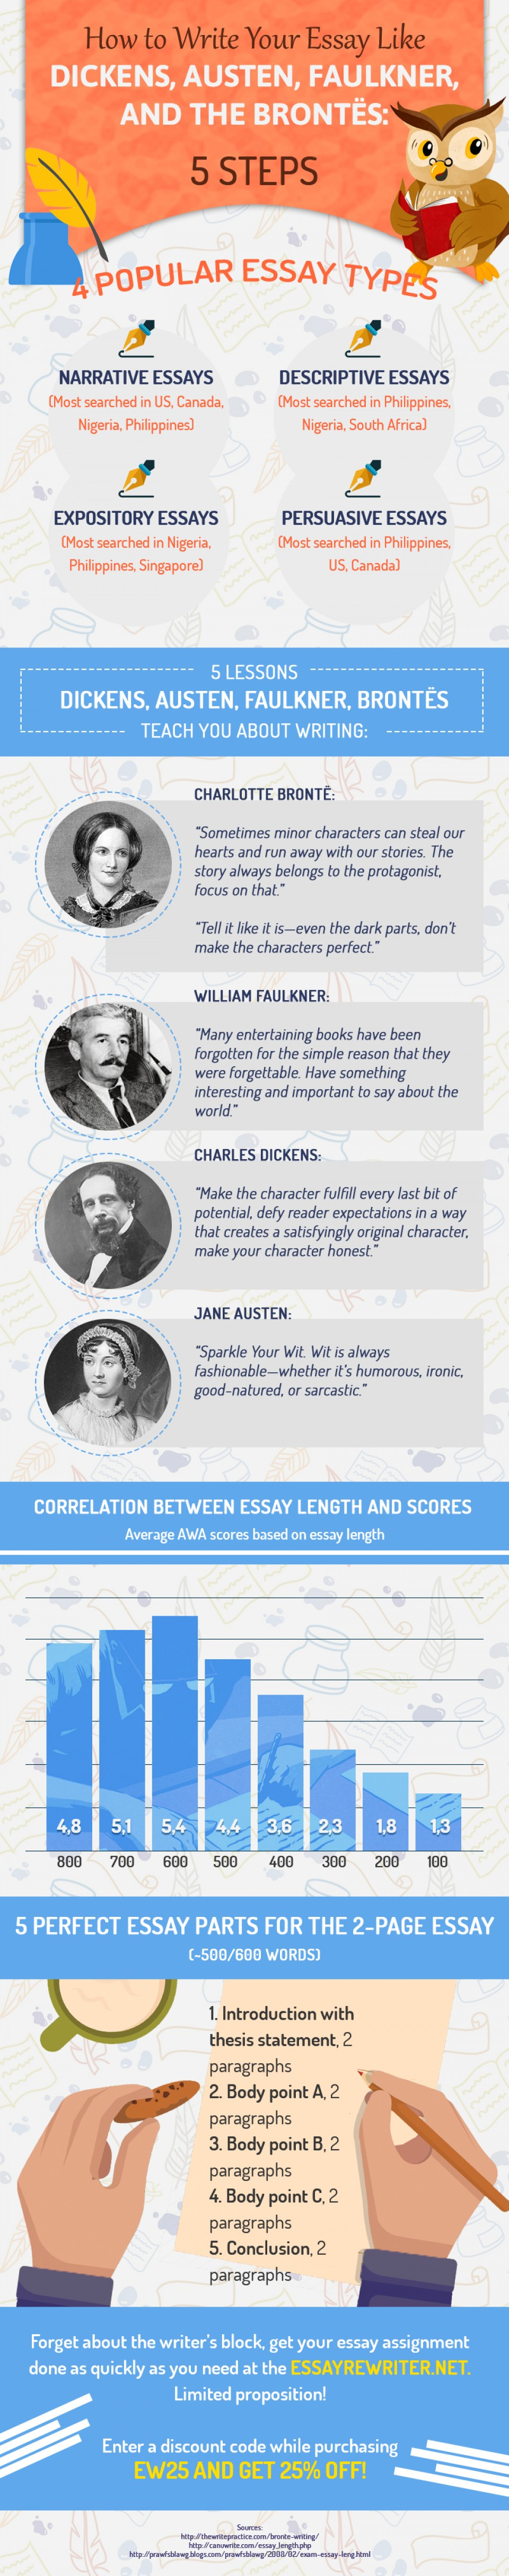 021 Essay Rewriter Example Writing Singular Free Software Crack Generator 960